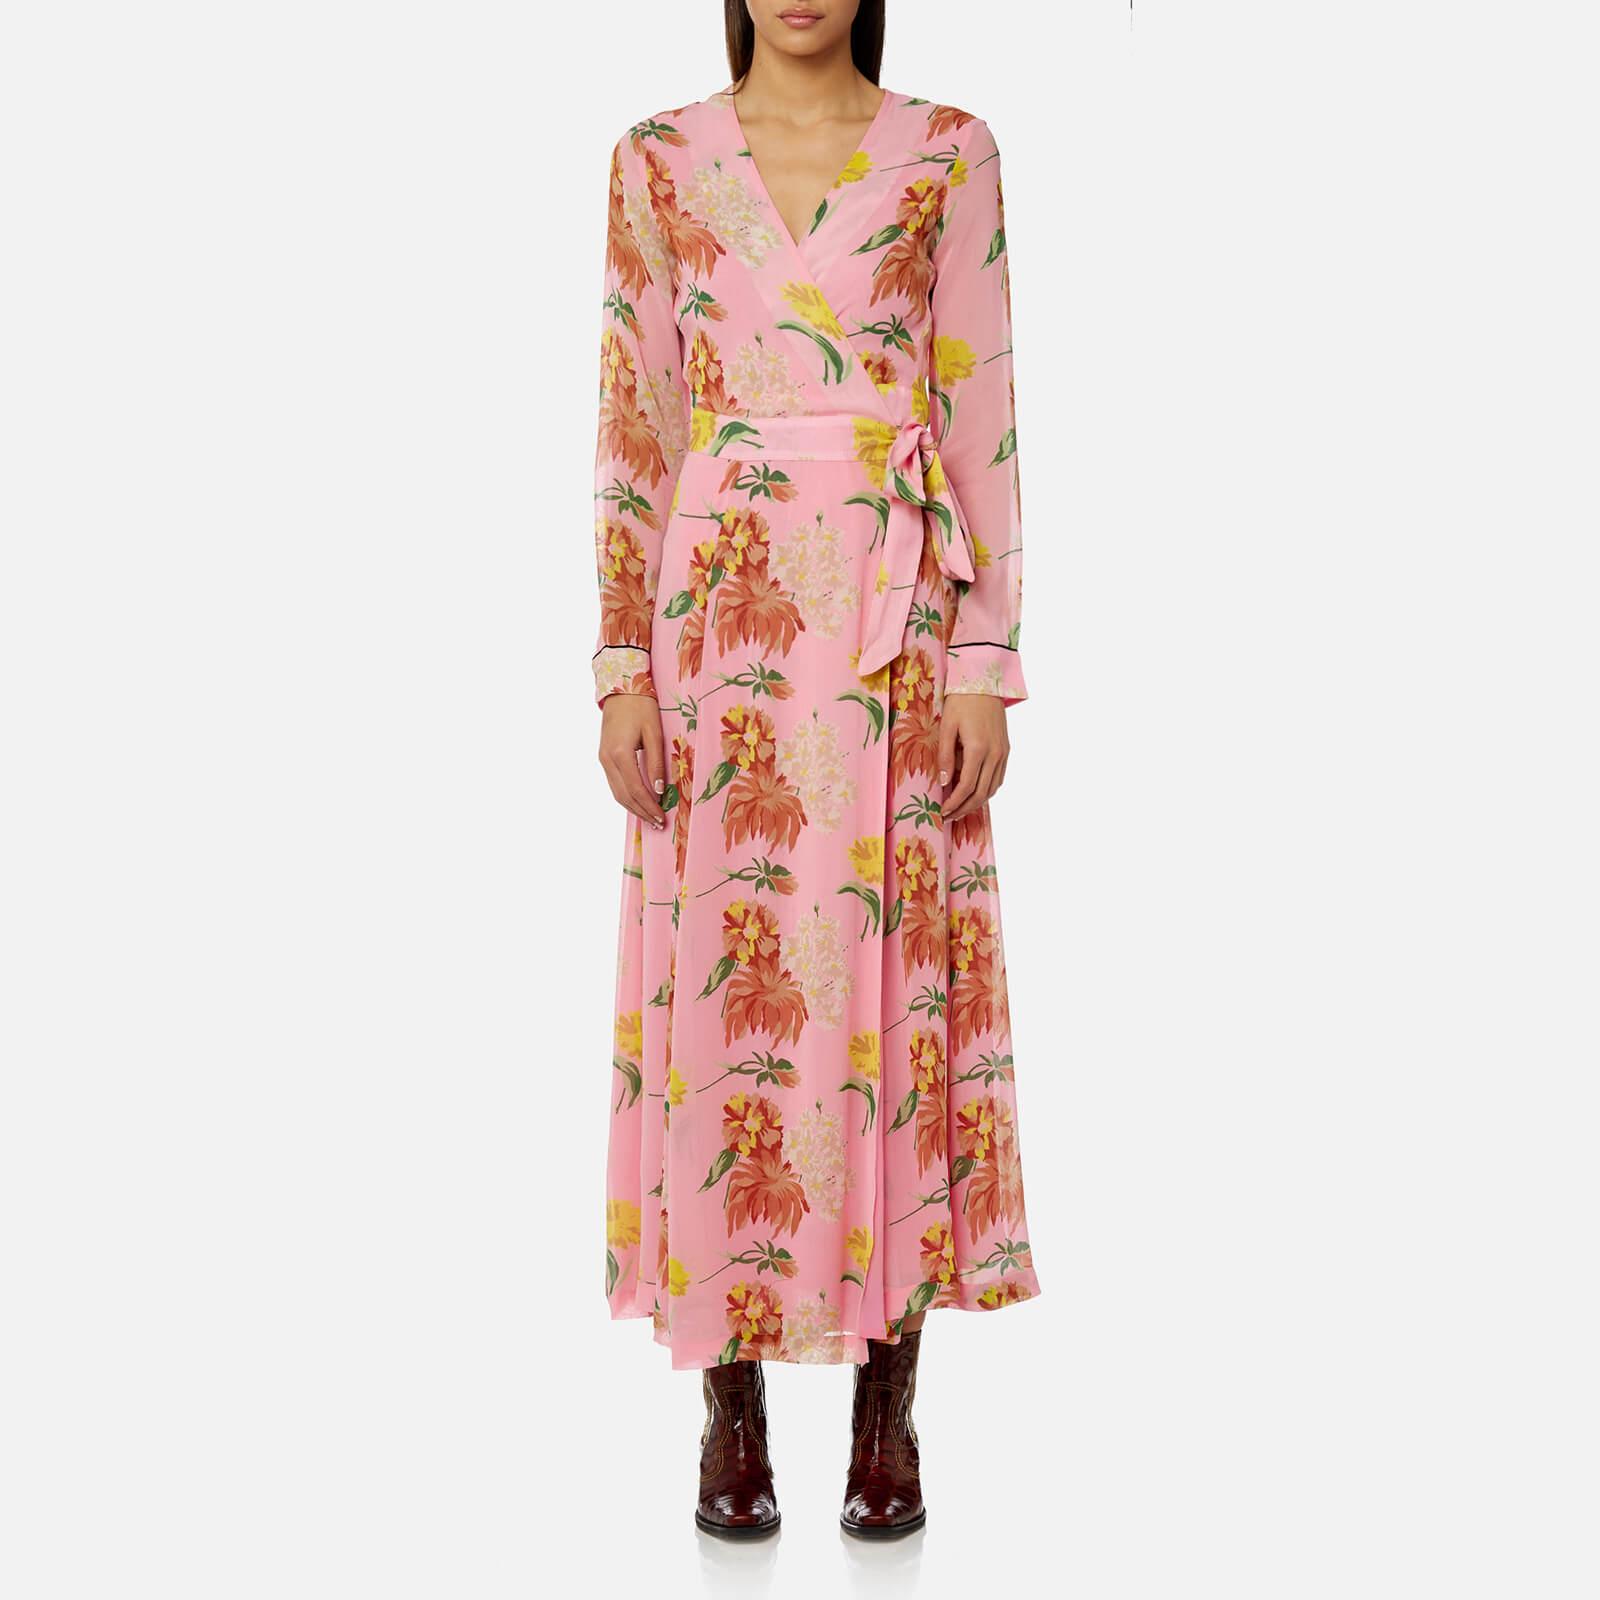 02d2b21196dc Ganni Women's Marceau Georgette Dress - Sea Pink - Free UK Delivery over £50